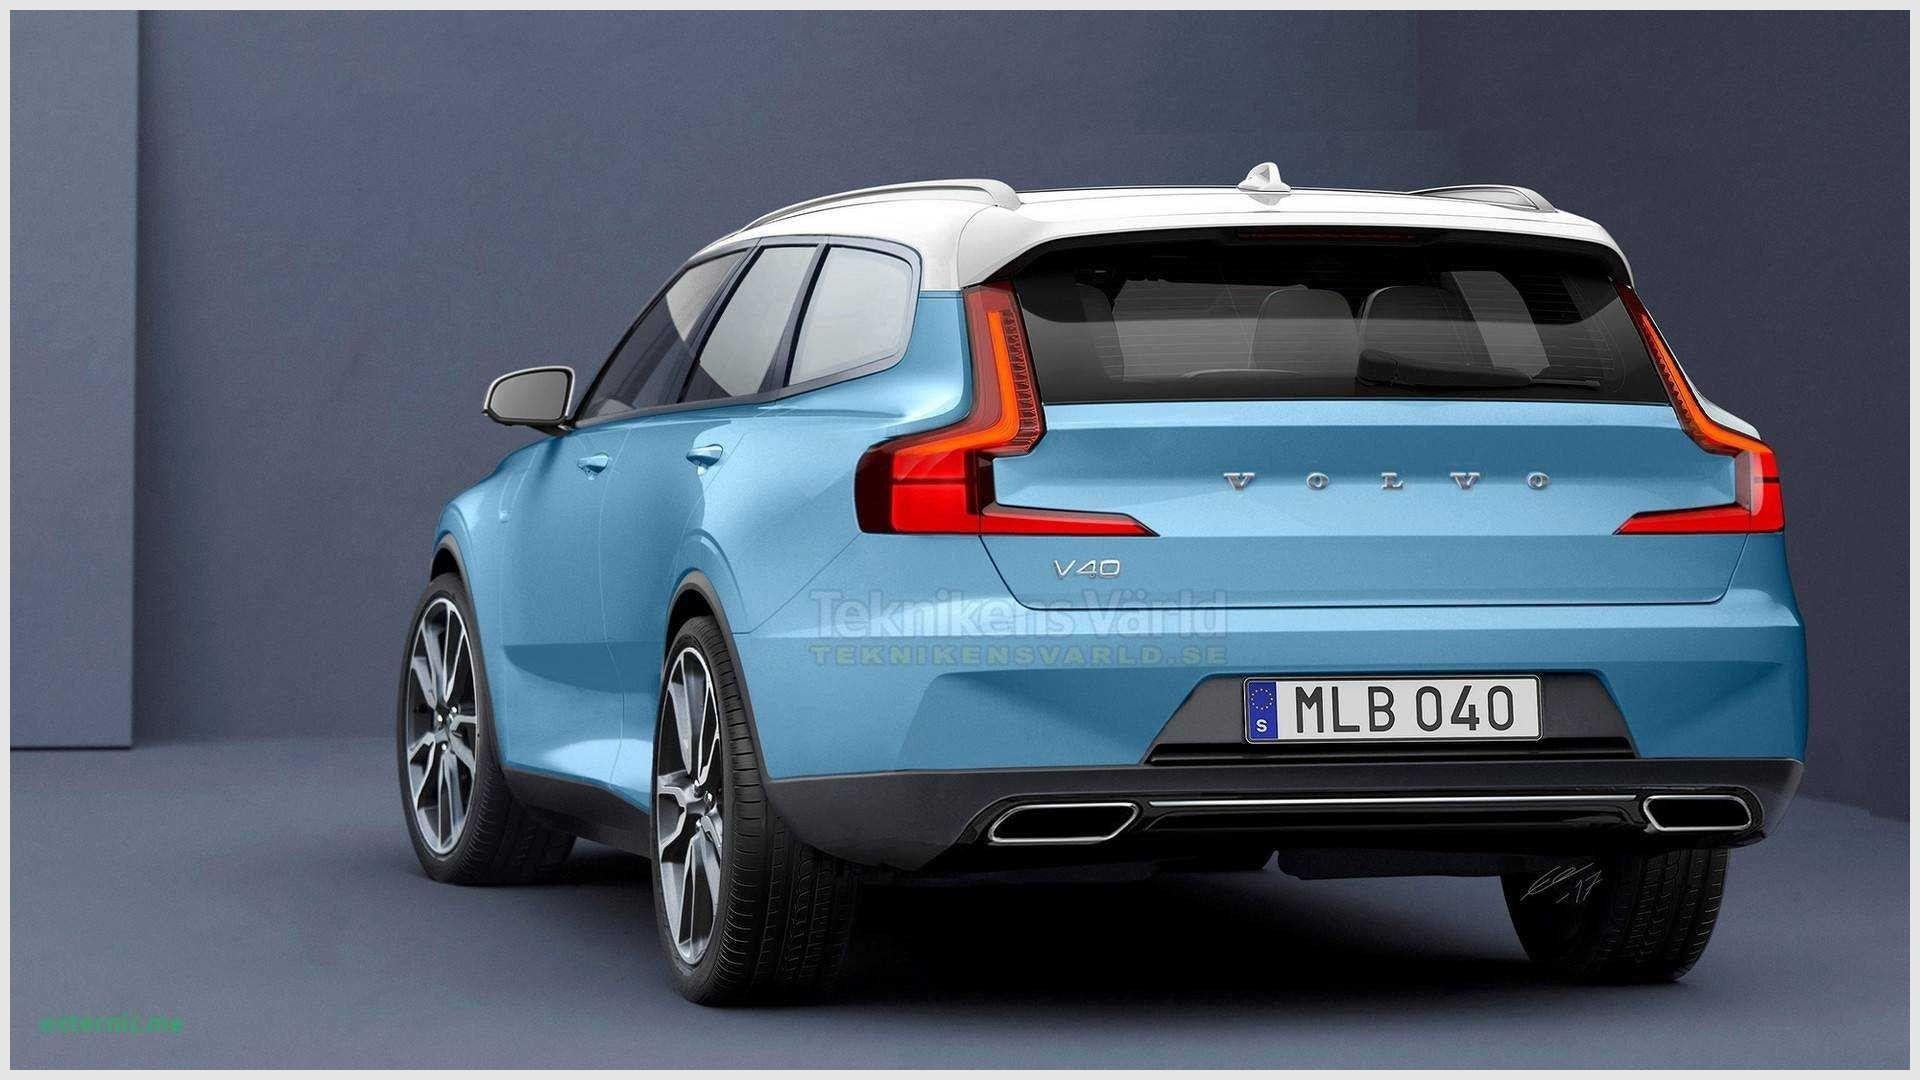 Volvo by 2020 Beautiful 2020 Volvo V60 2019 Volvo S60